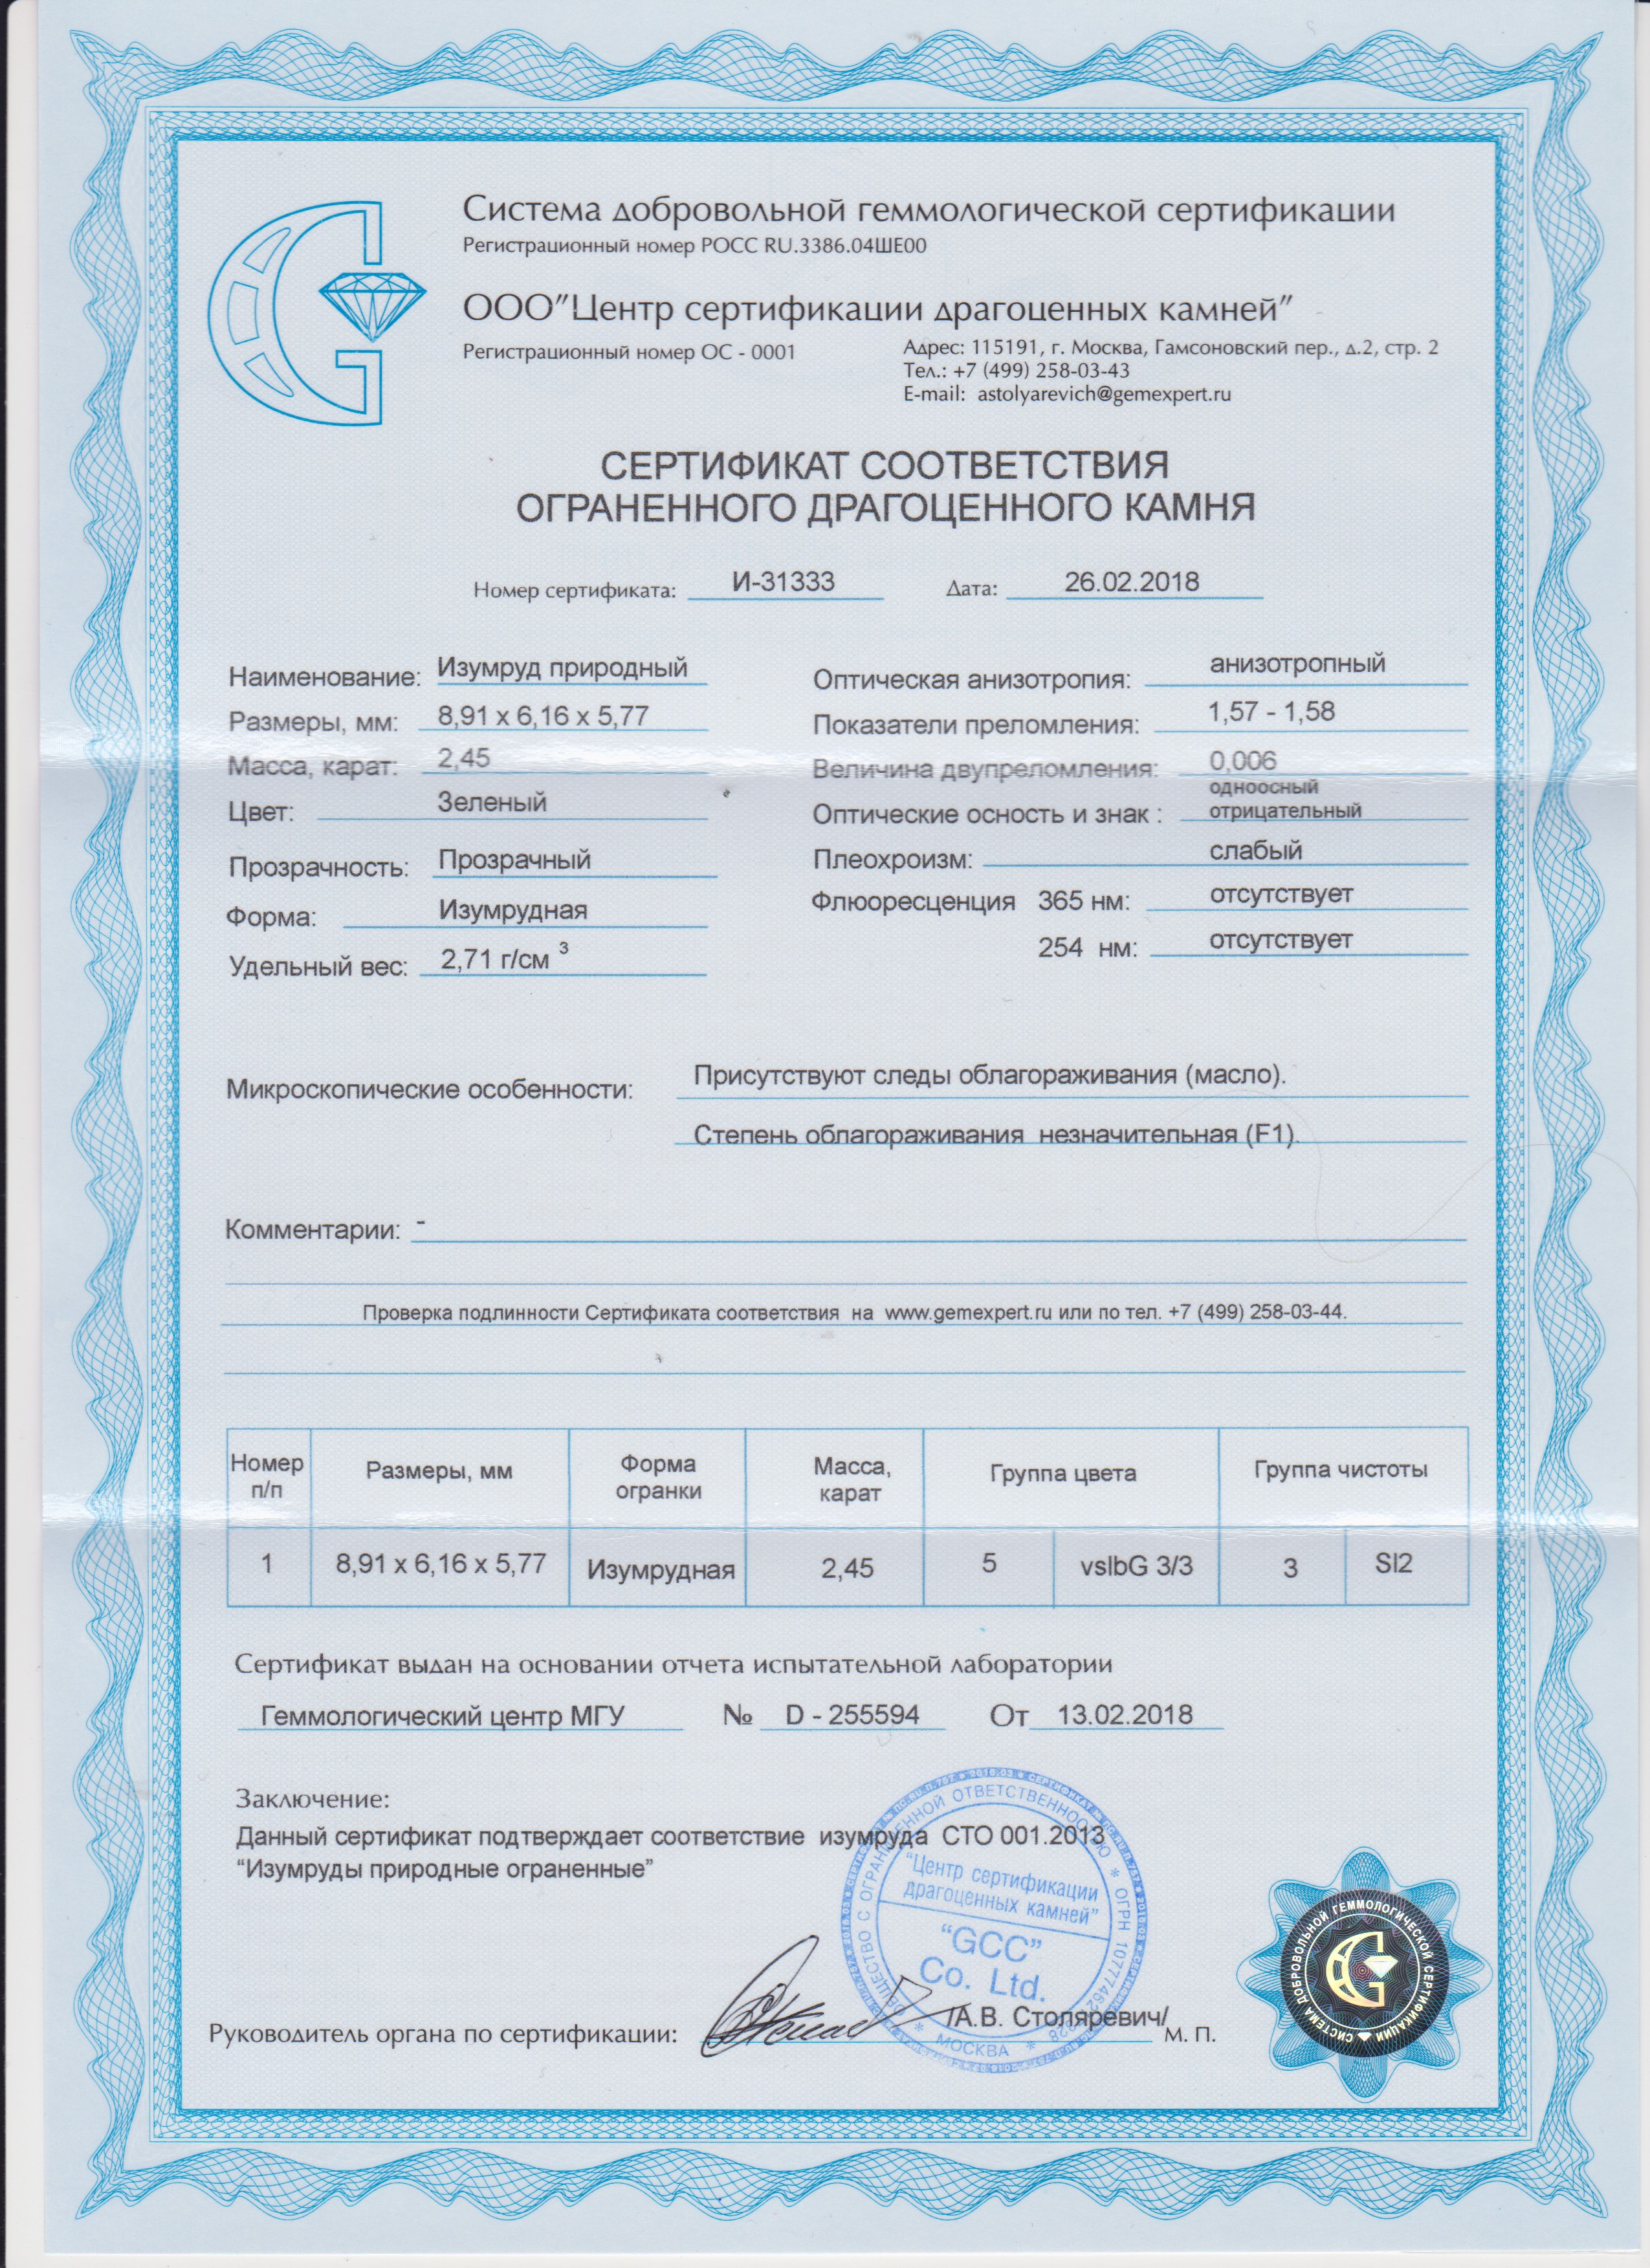 https://mineralmarket.ru/img/certificate/52/1520250233.jpg